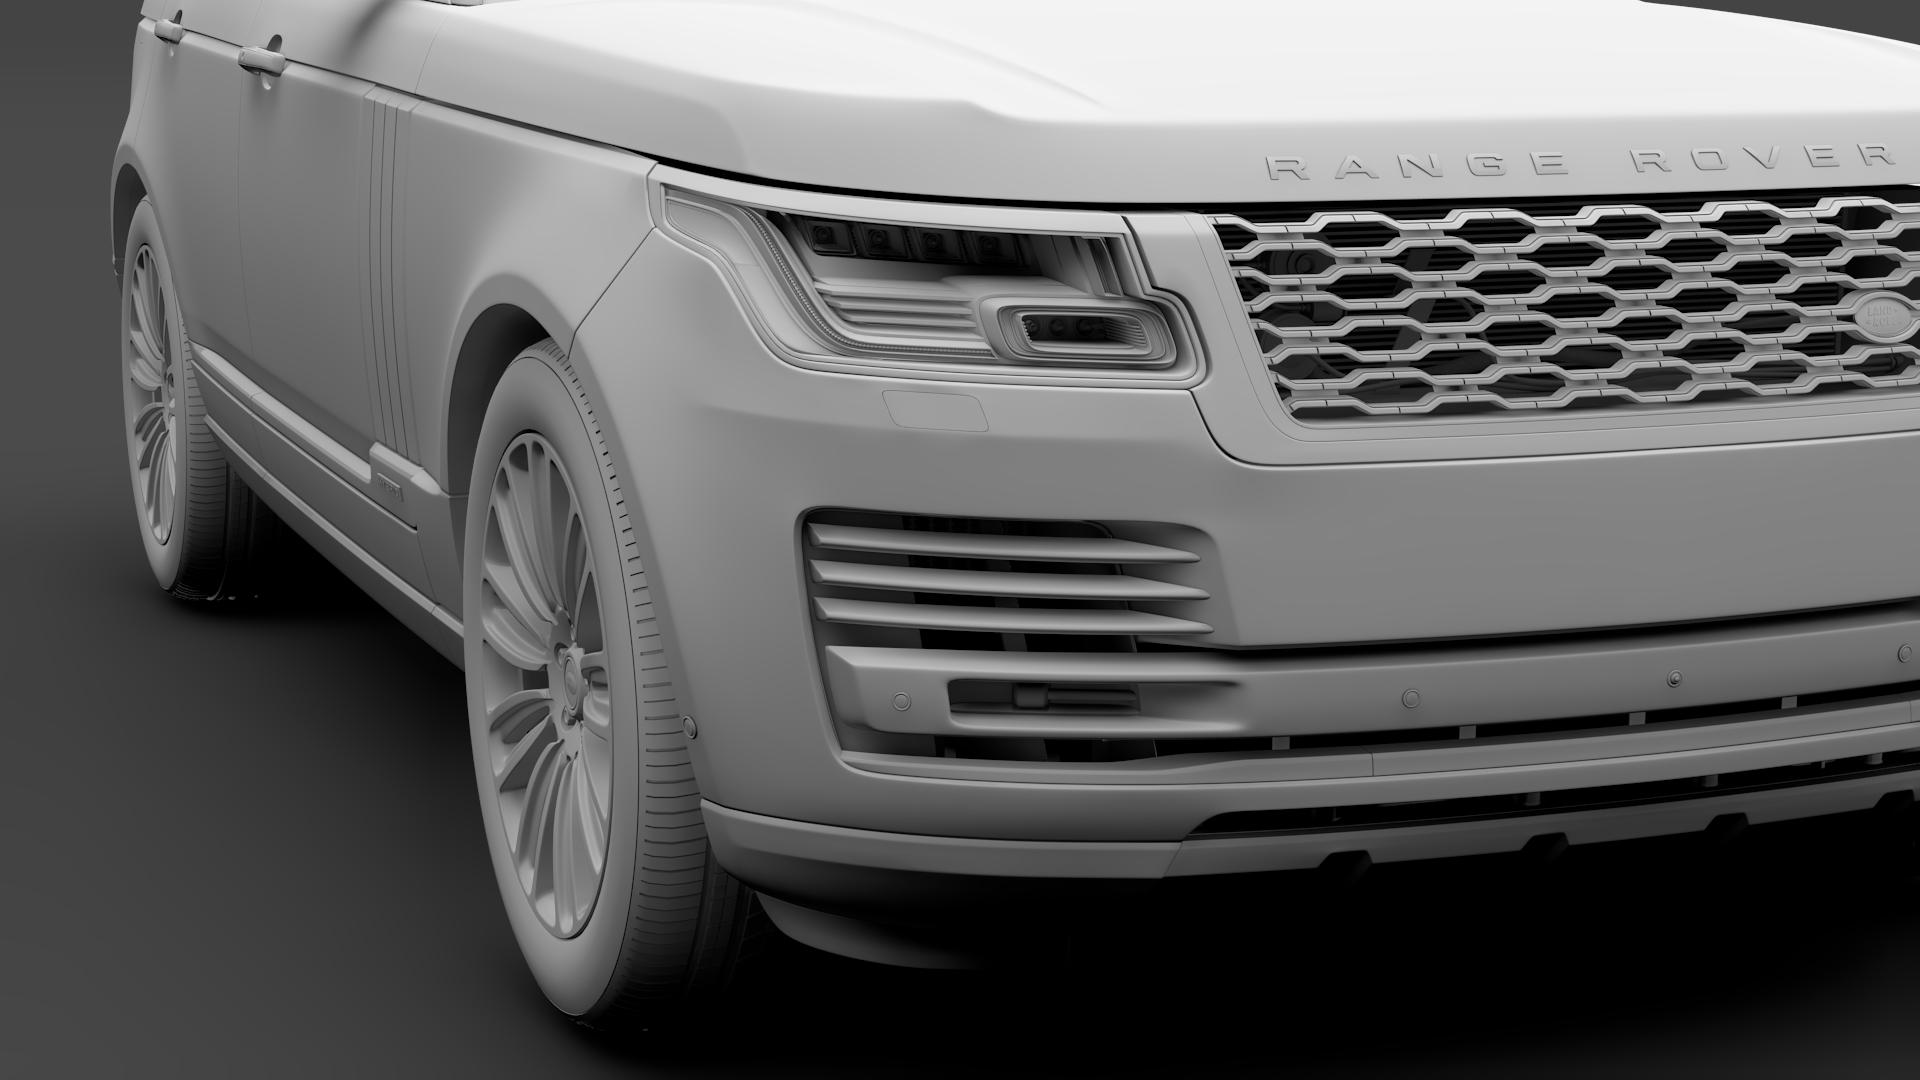 range rover autobiography hybrid (l405) 2018 3d model max fbx c4d lwo ma mb hrc xsi obj 278154